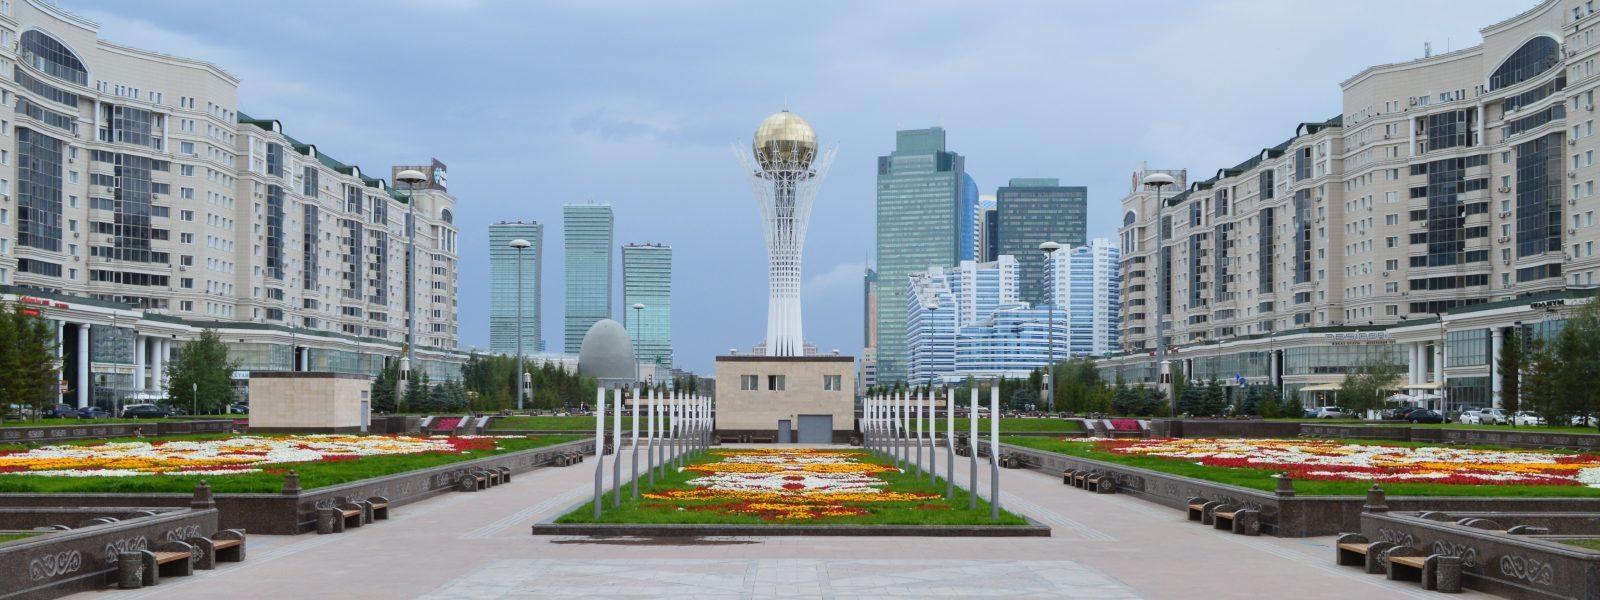 Nur-Sultan, Kazakhstan Best Things to do